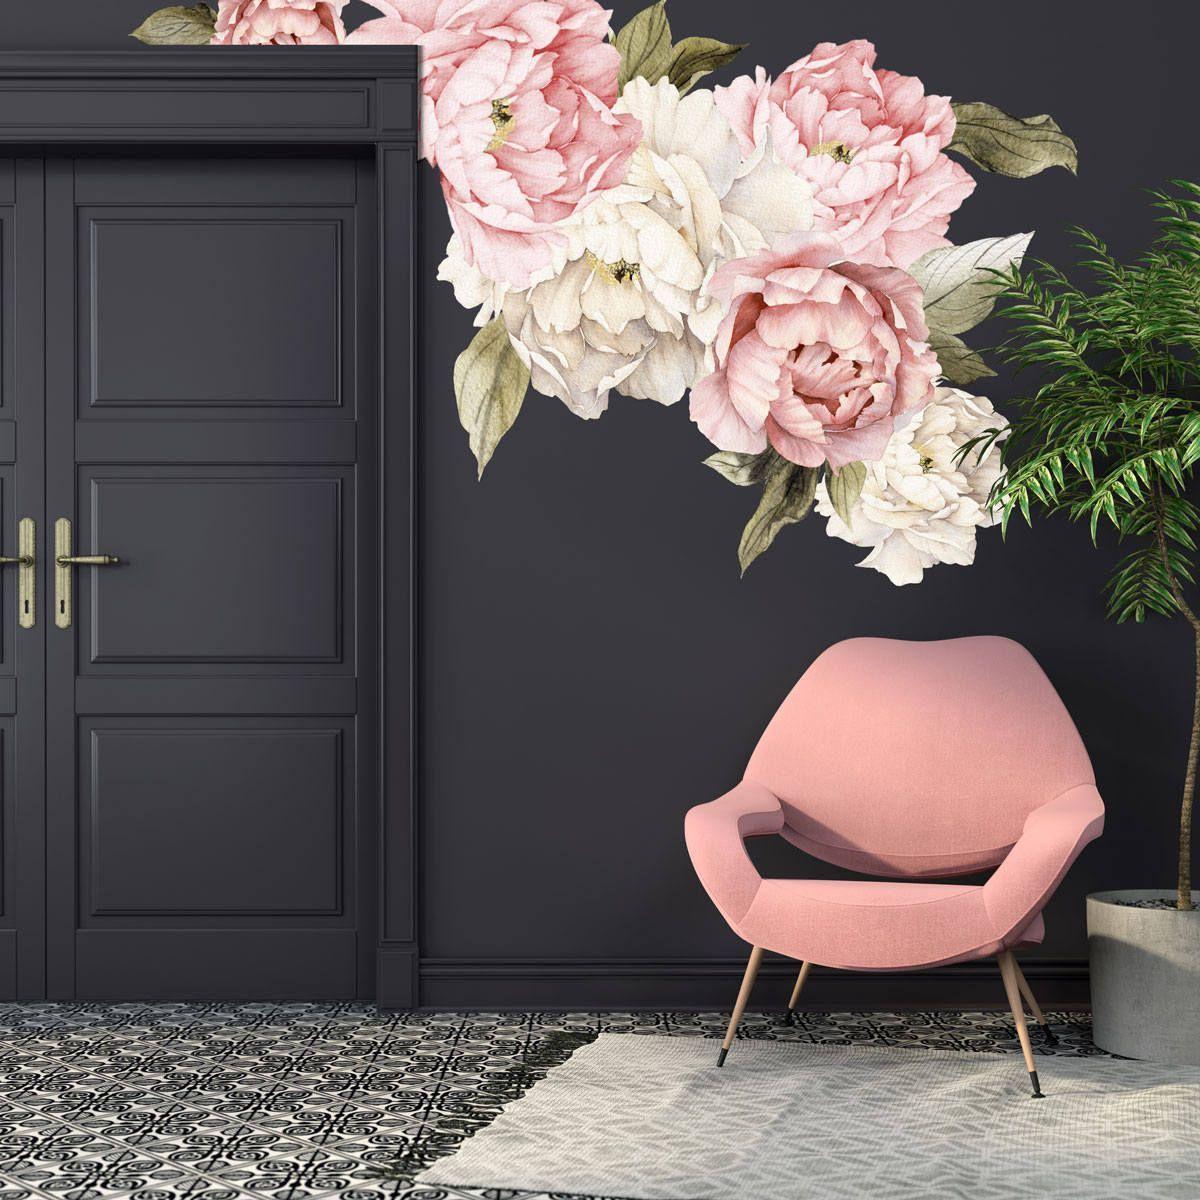 Pfingstrose Aufkleber - Floral Wall Decals Aquarell Pfingstrose große selbst Klebstoff Wallpaper - Tapete Wandbild - schälen und Stick-Wandtattoo #setinstains